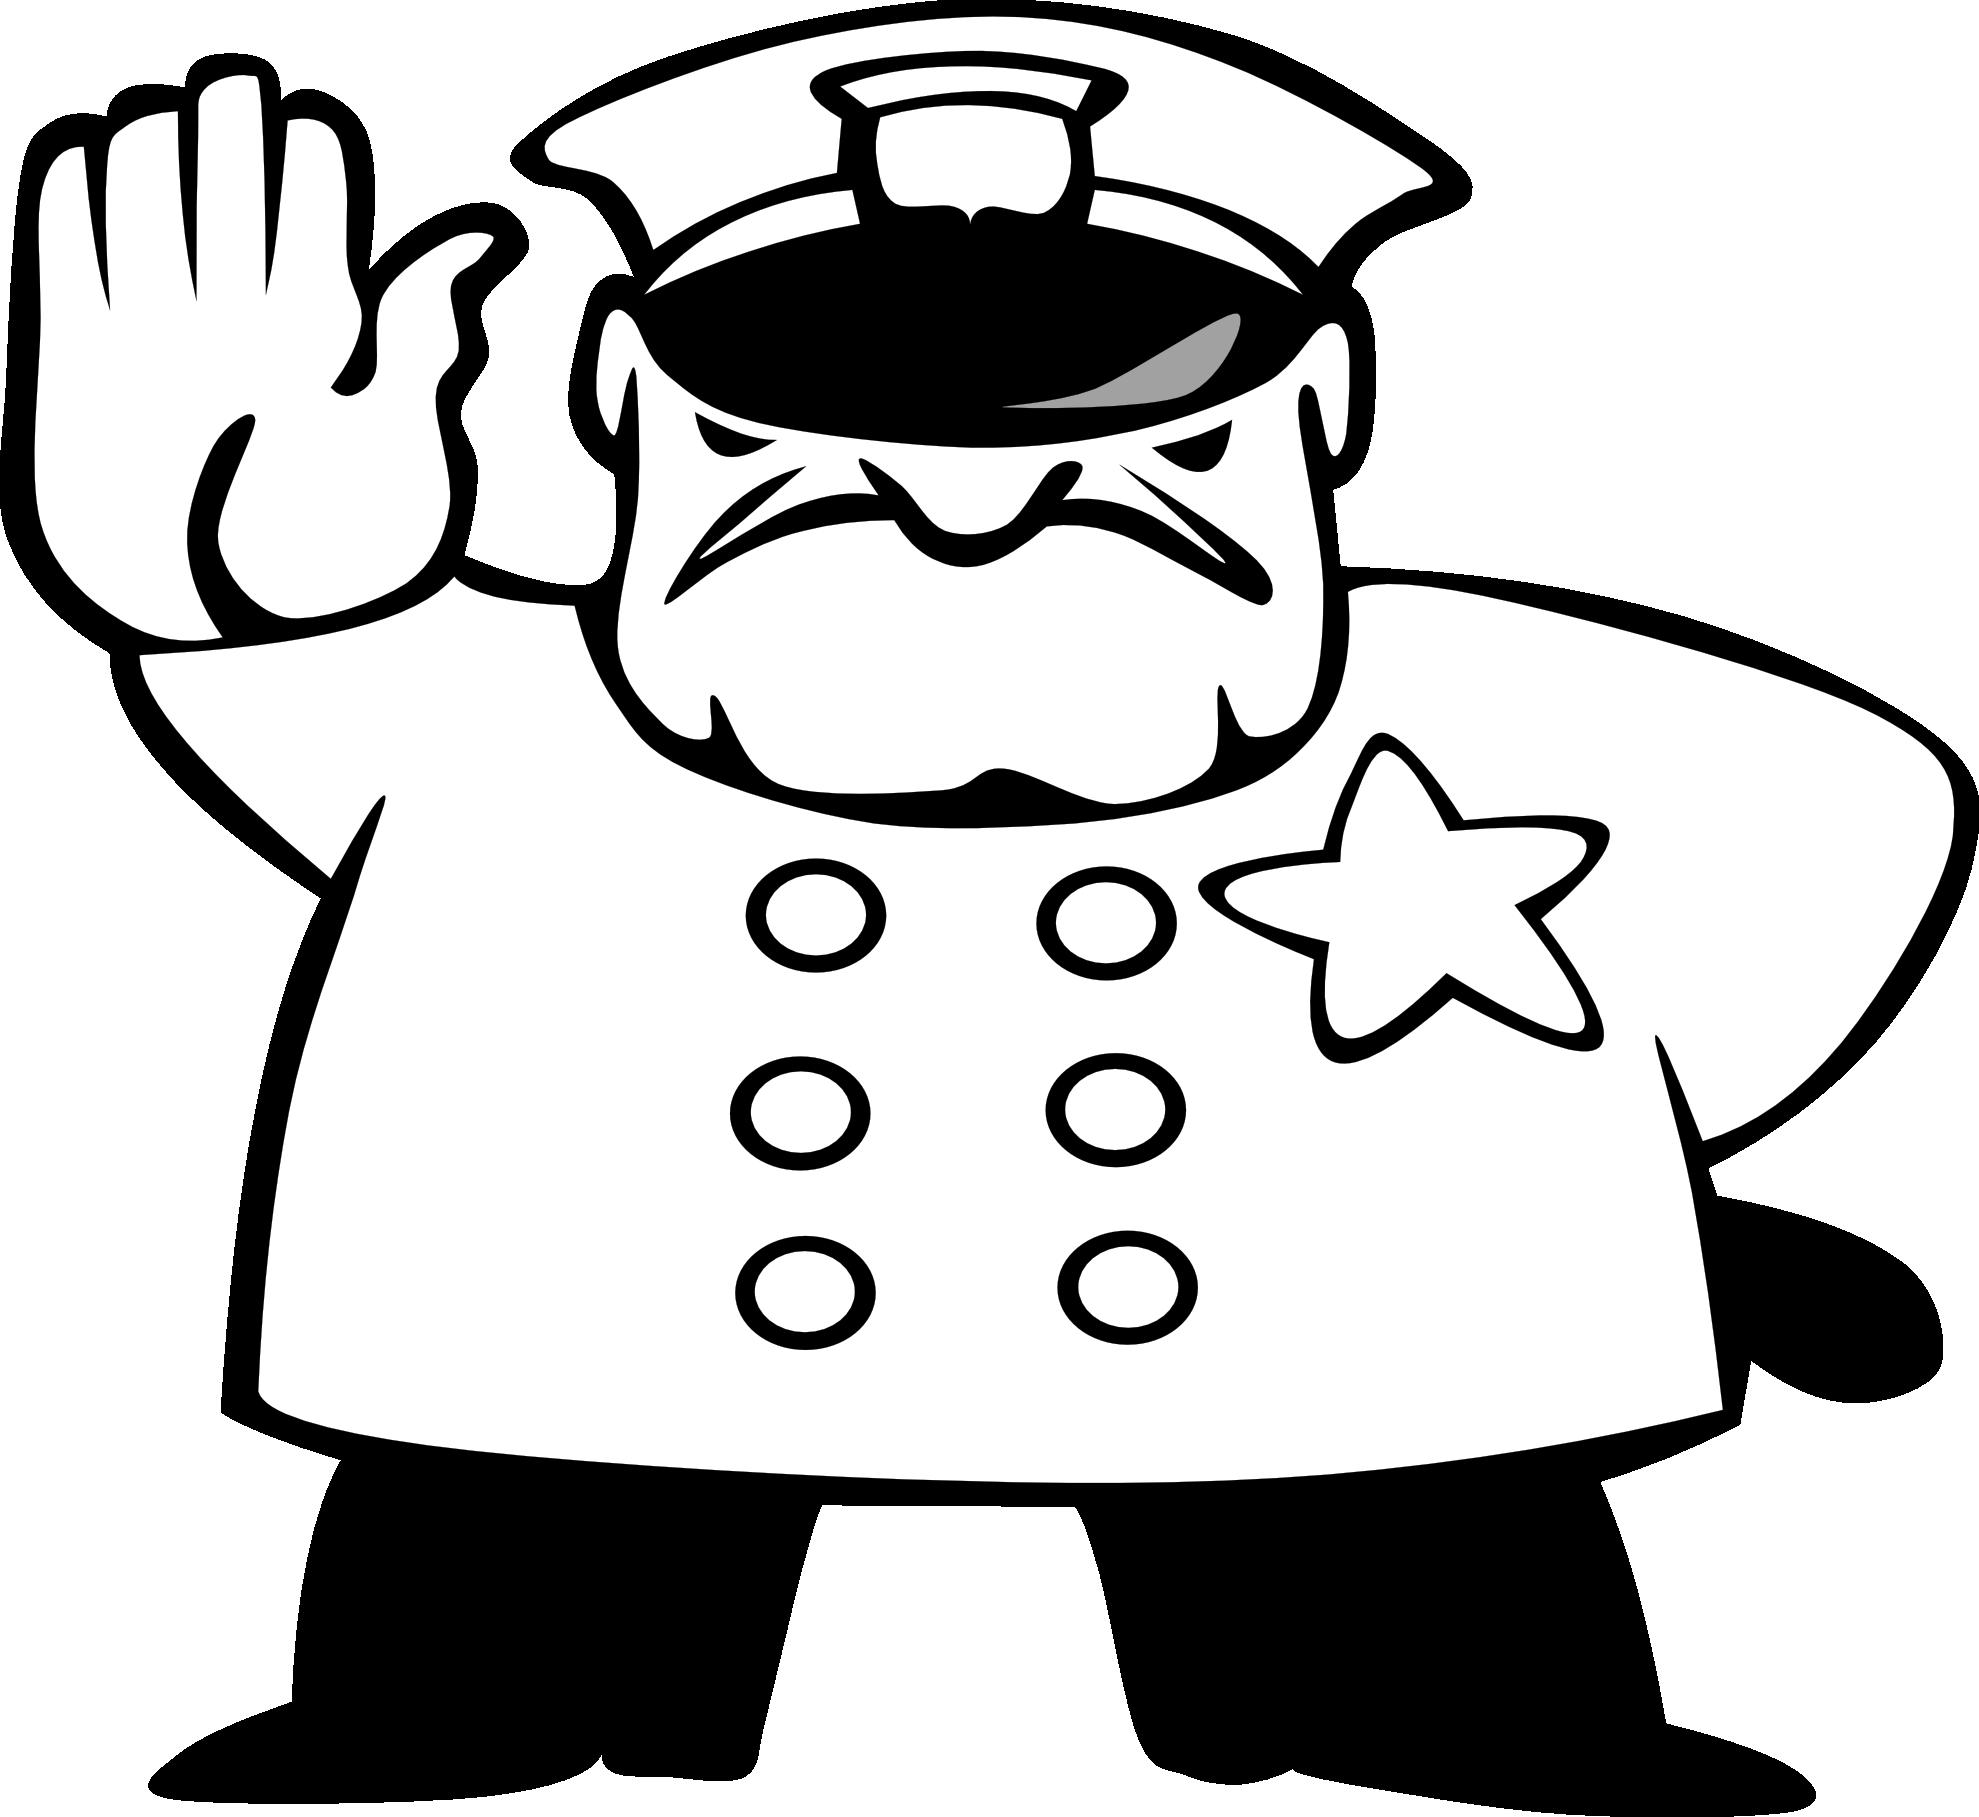 Clip art police clipart image 1 3